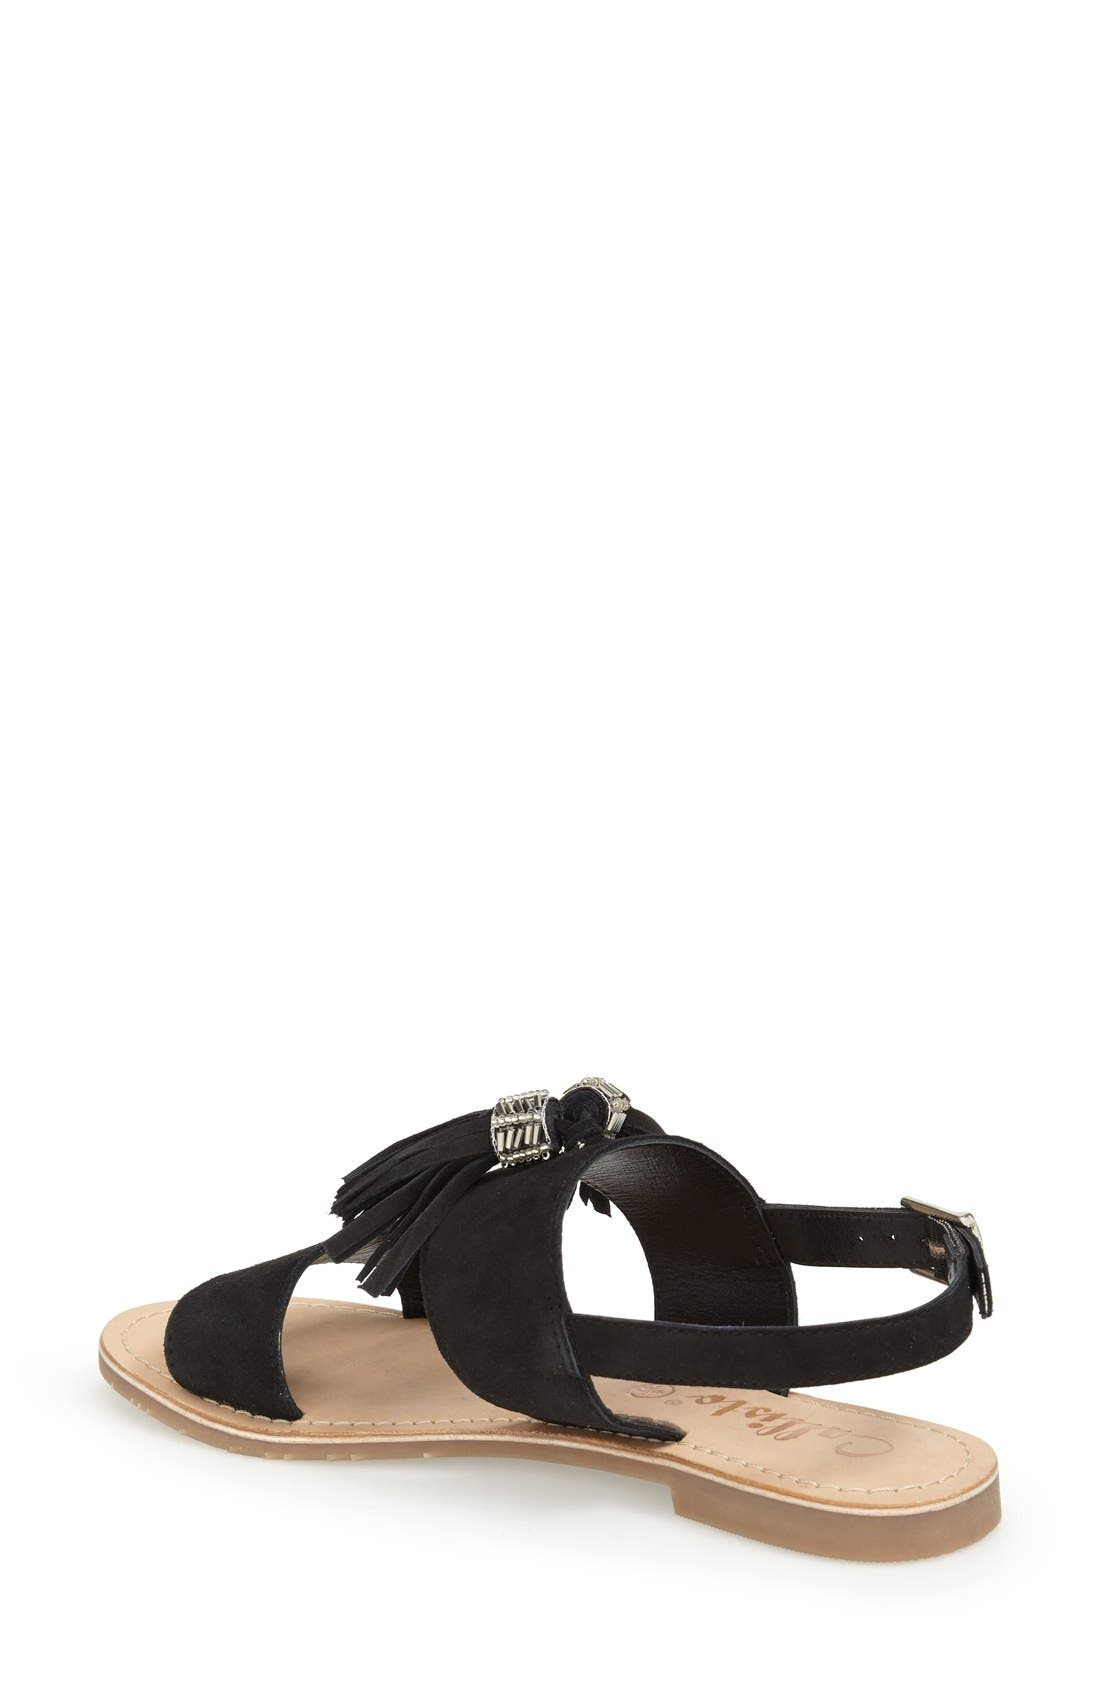 CALLISTO,                             'Anandi' Tassel Flat Sandal,                             Alternate thumbnail 2, color,                             001